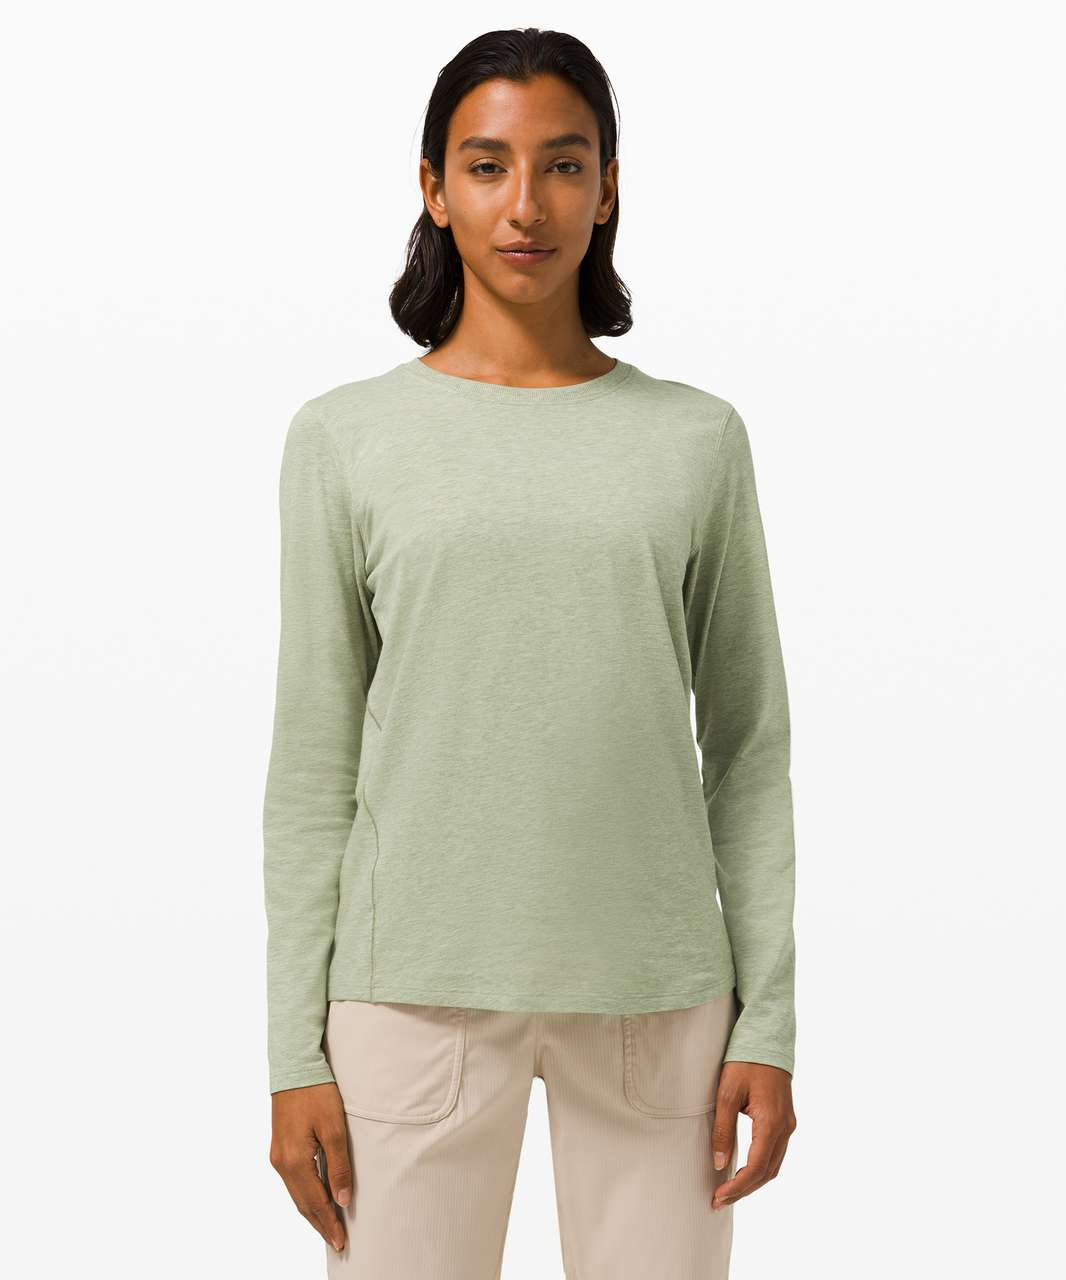 Lululemon Ever Ready Long Sleeve - Heathered Rosemary Green